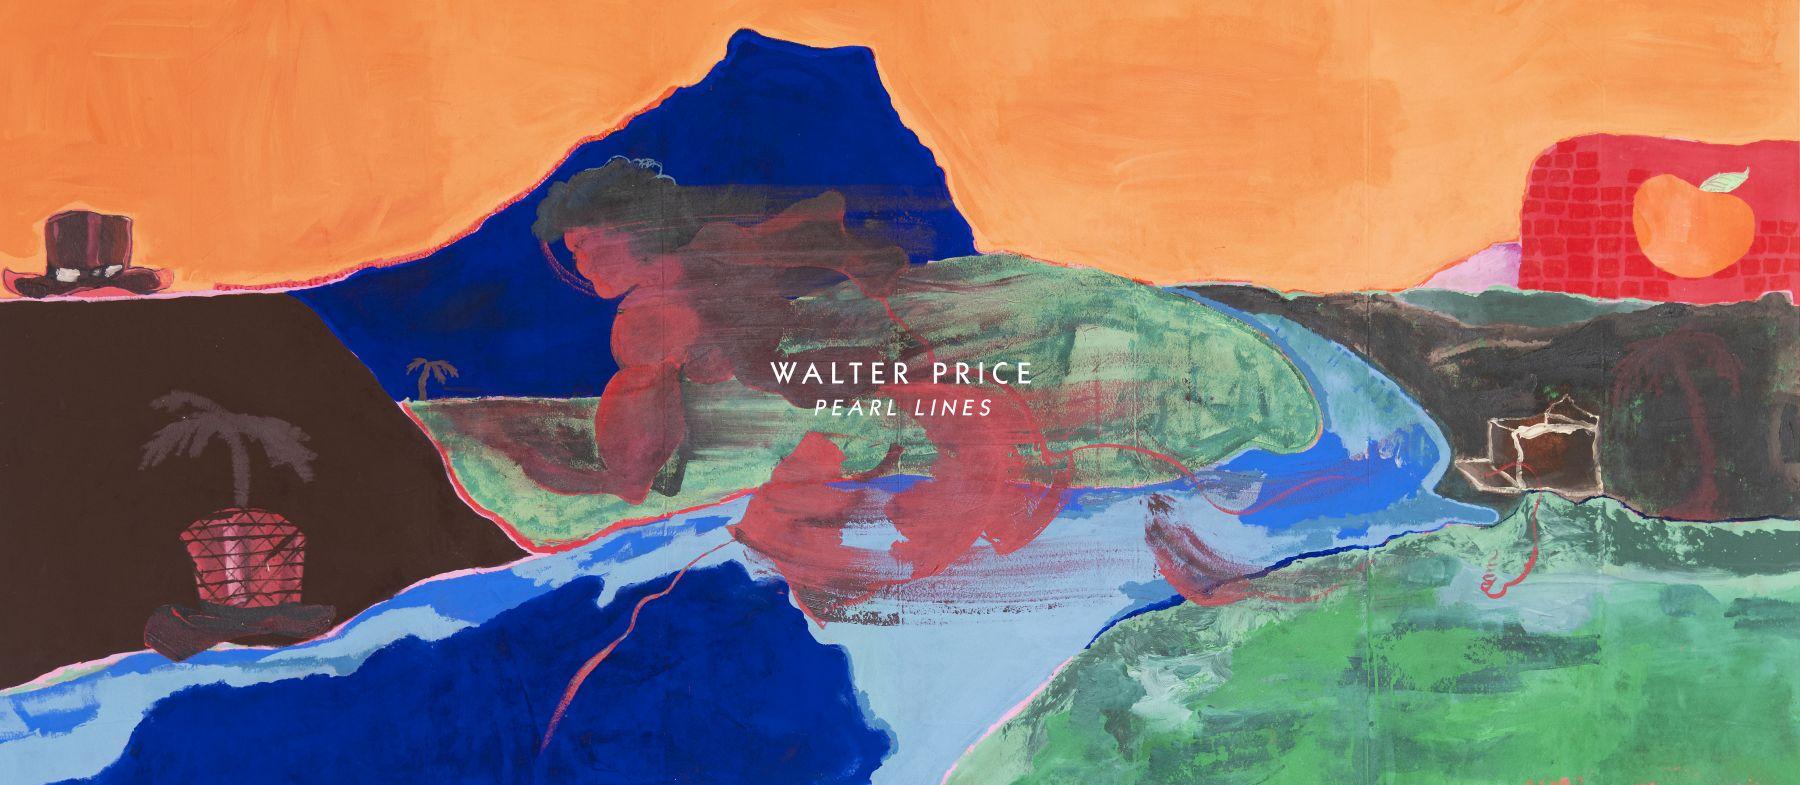 Walter Price